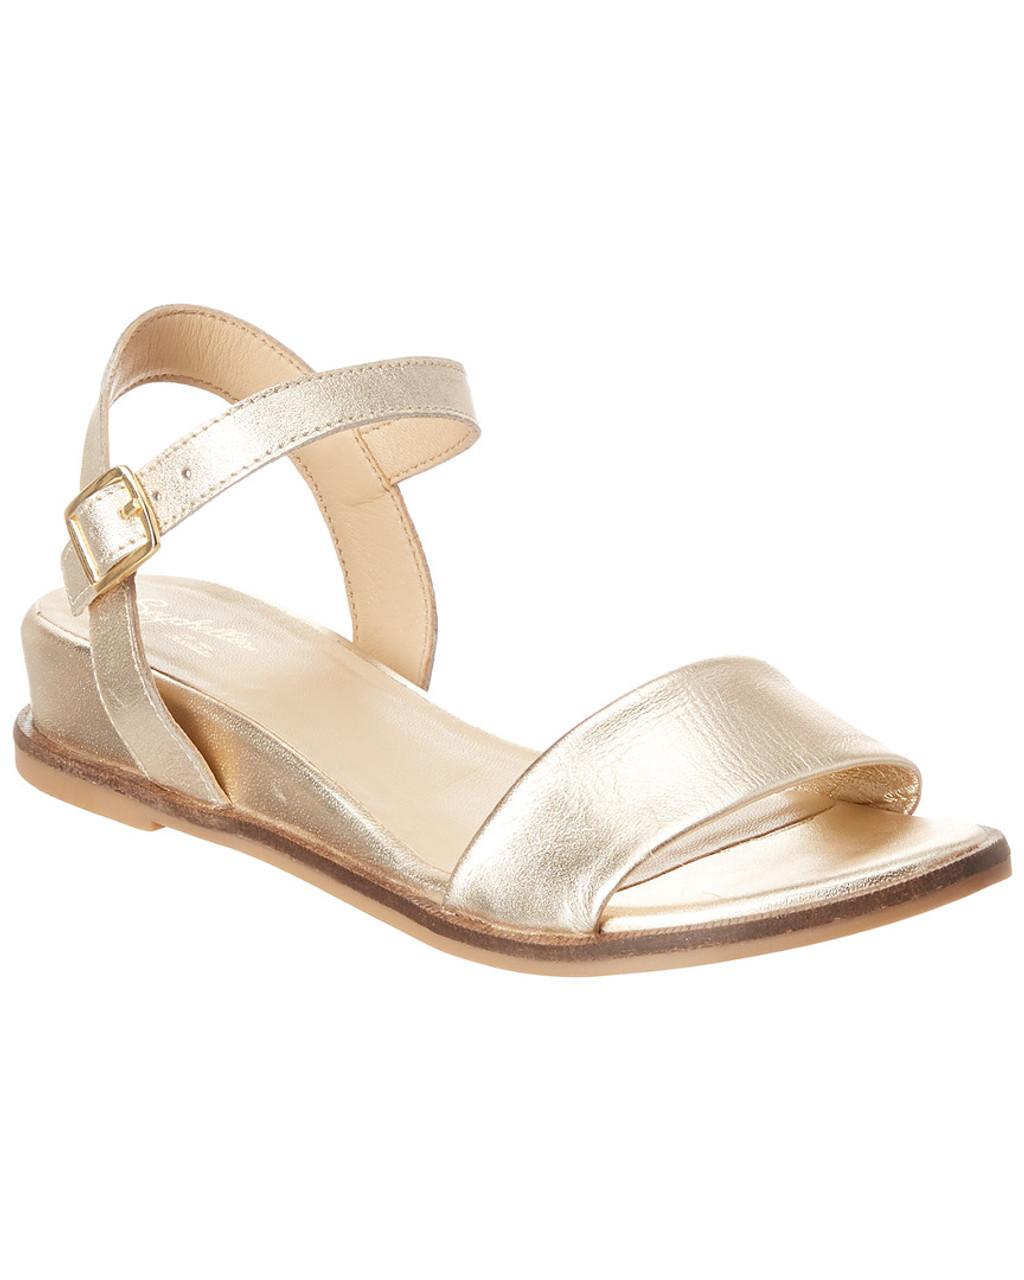 553e6b3b83 Seychelles Boardwalk Leather Wedge Sandal~1311946840 - Boston Store